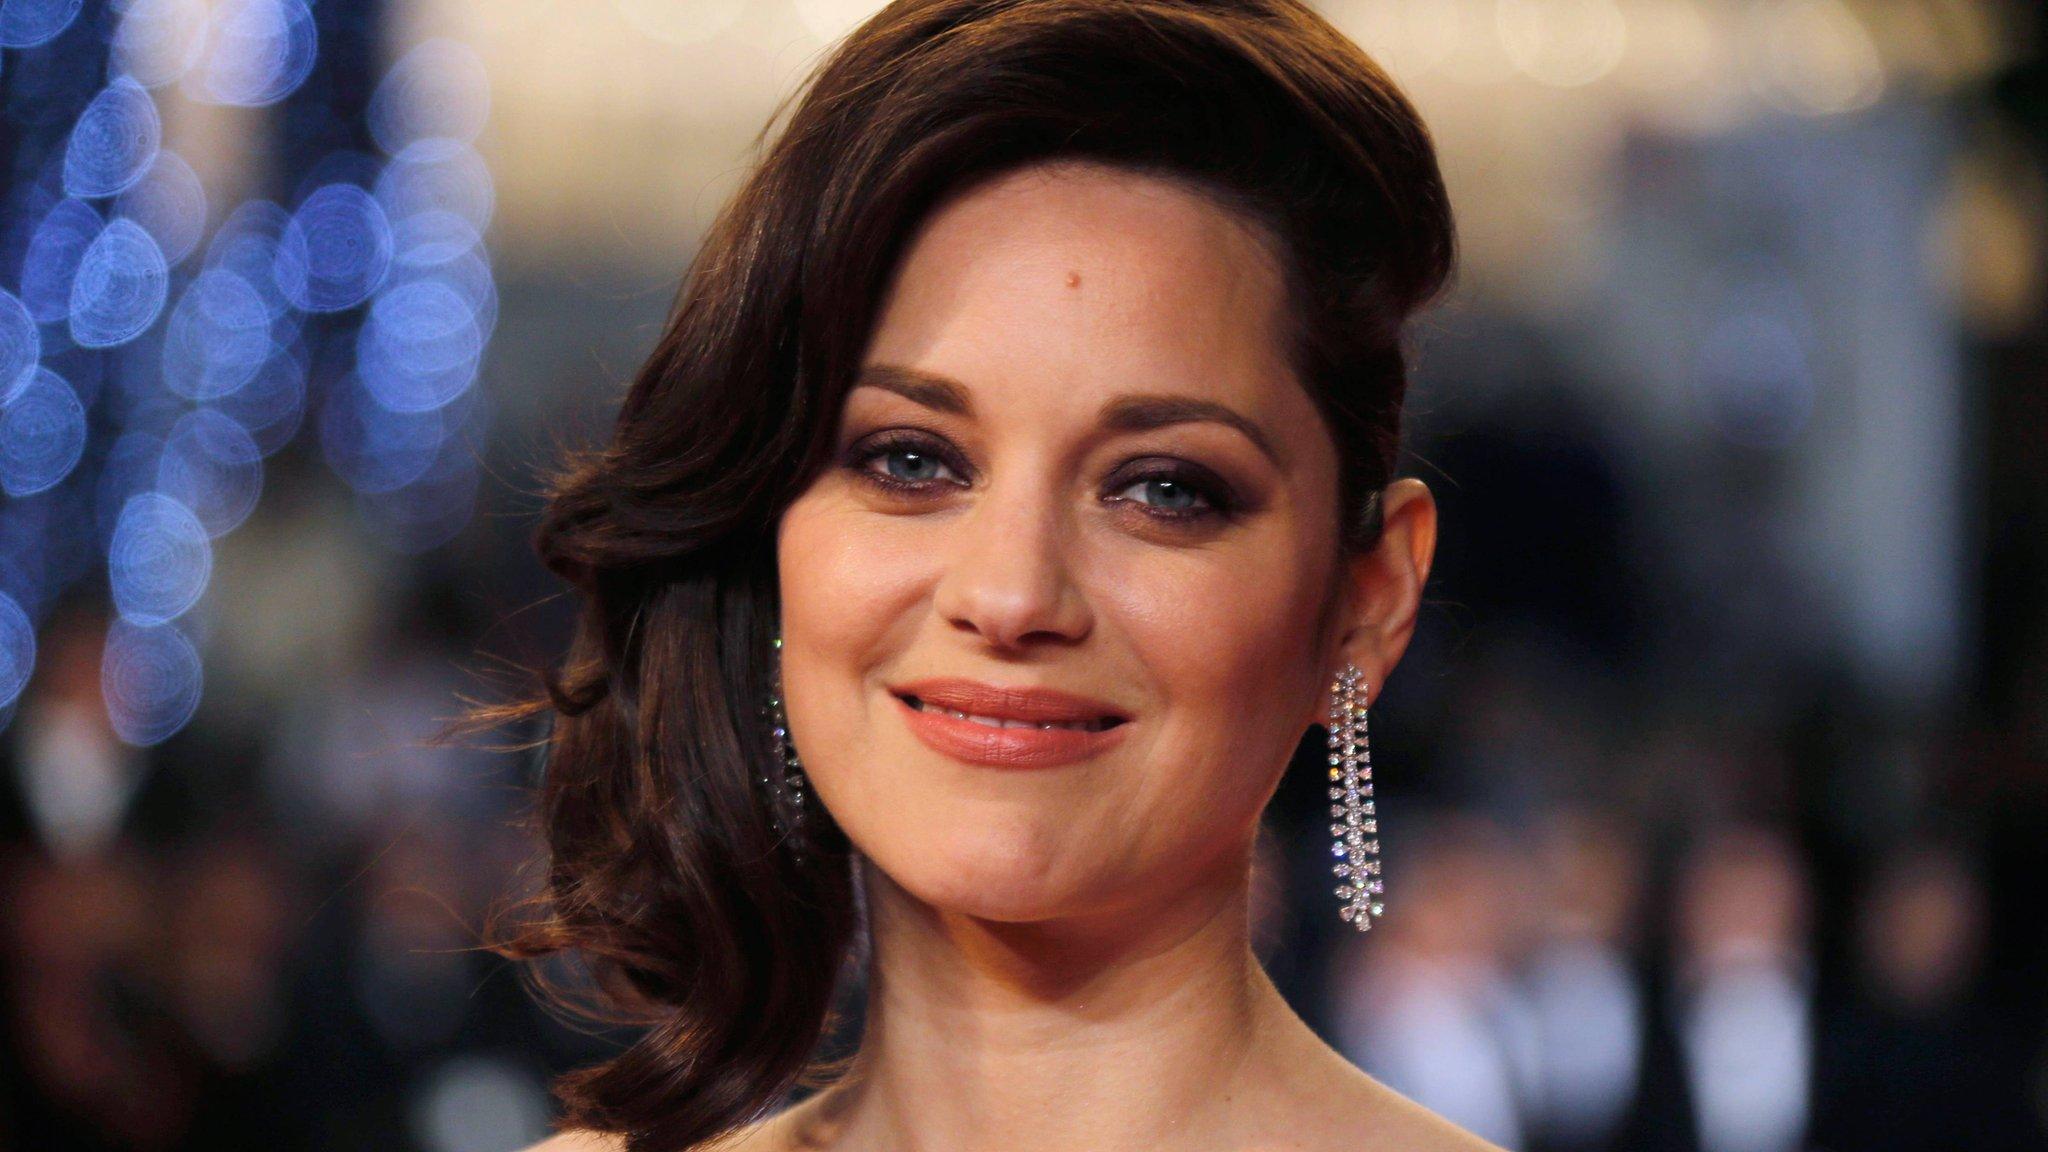 Marion Cotillard denies Brad Pitt affair rumours